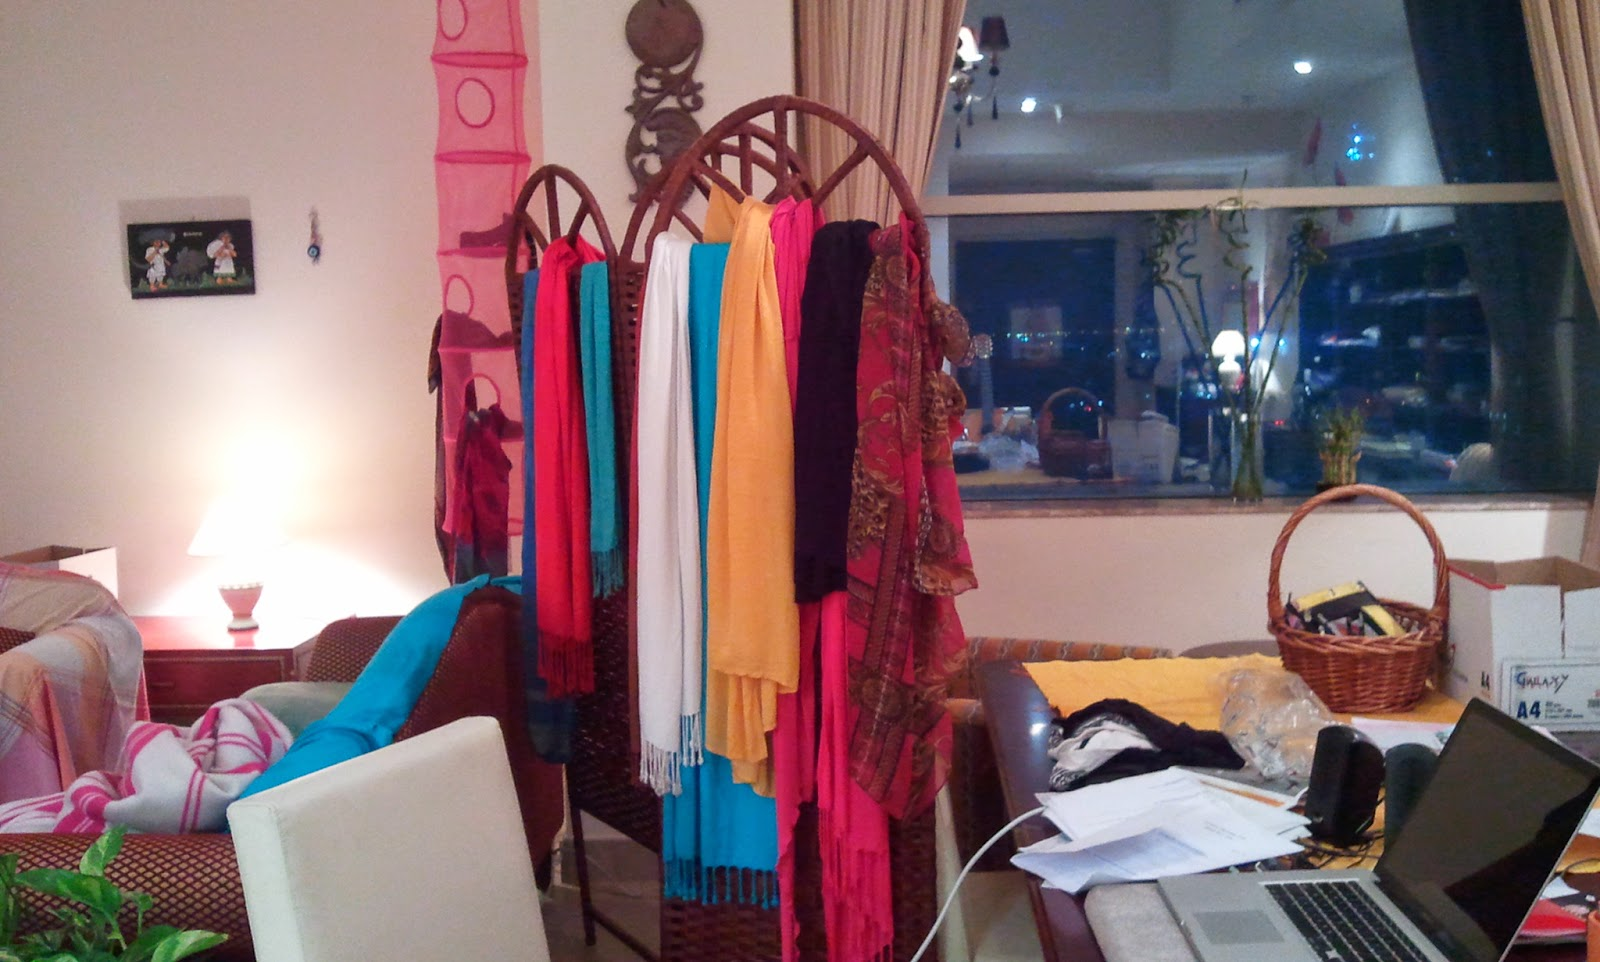 Hanging Chair Qatar Handicap Swing Liet In